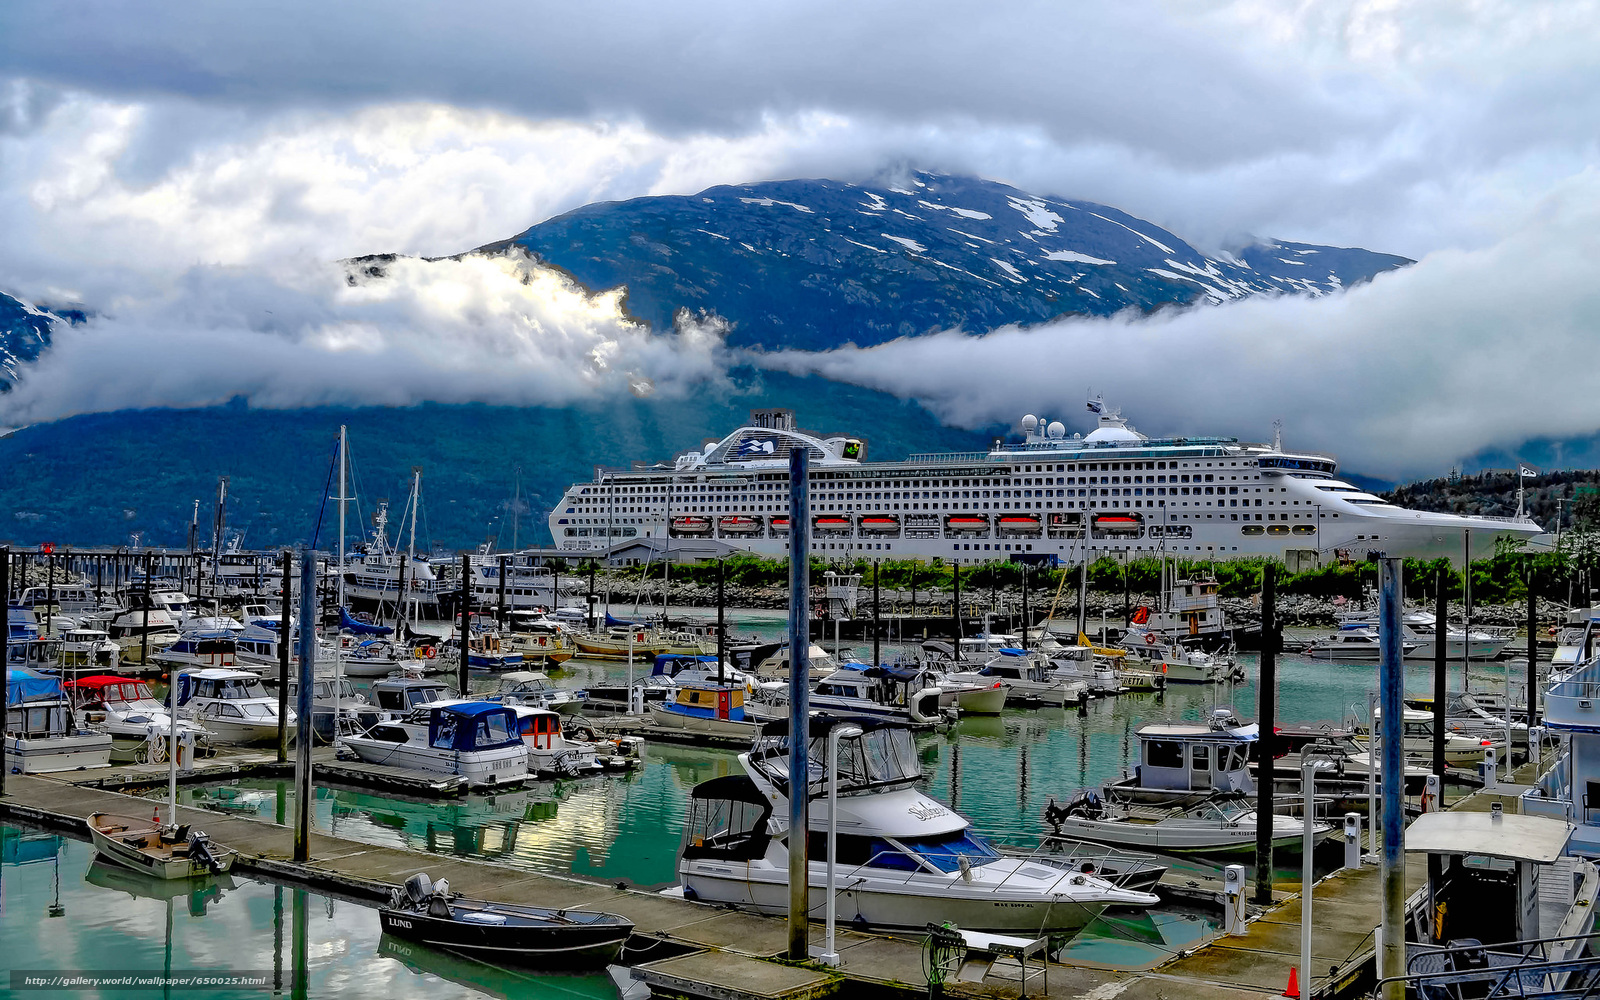 Docked in Skagway, Alaska, port, ship, Yacht, Boat